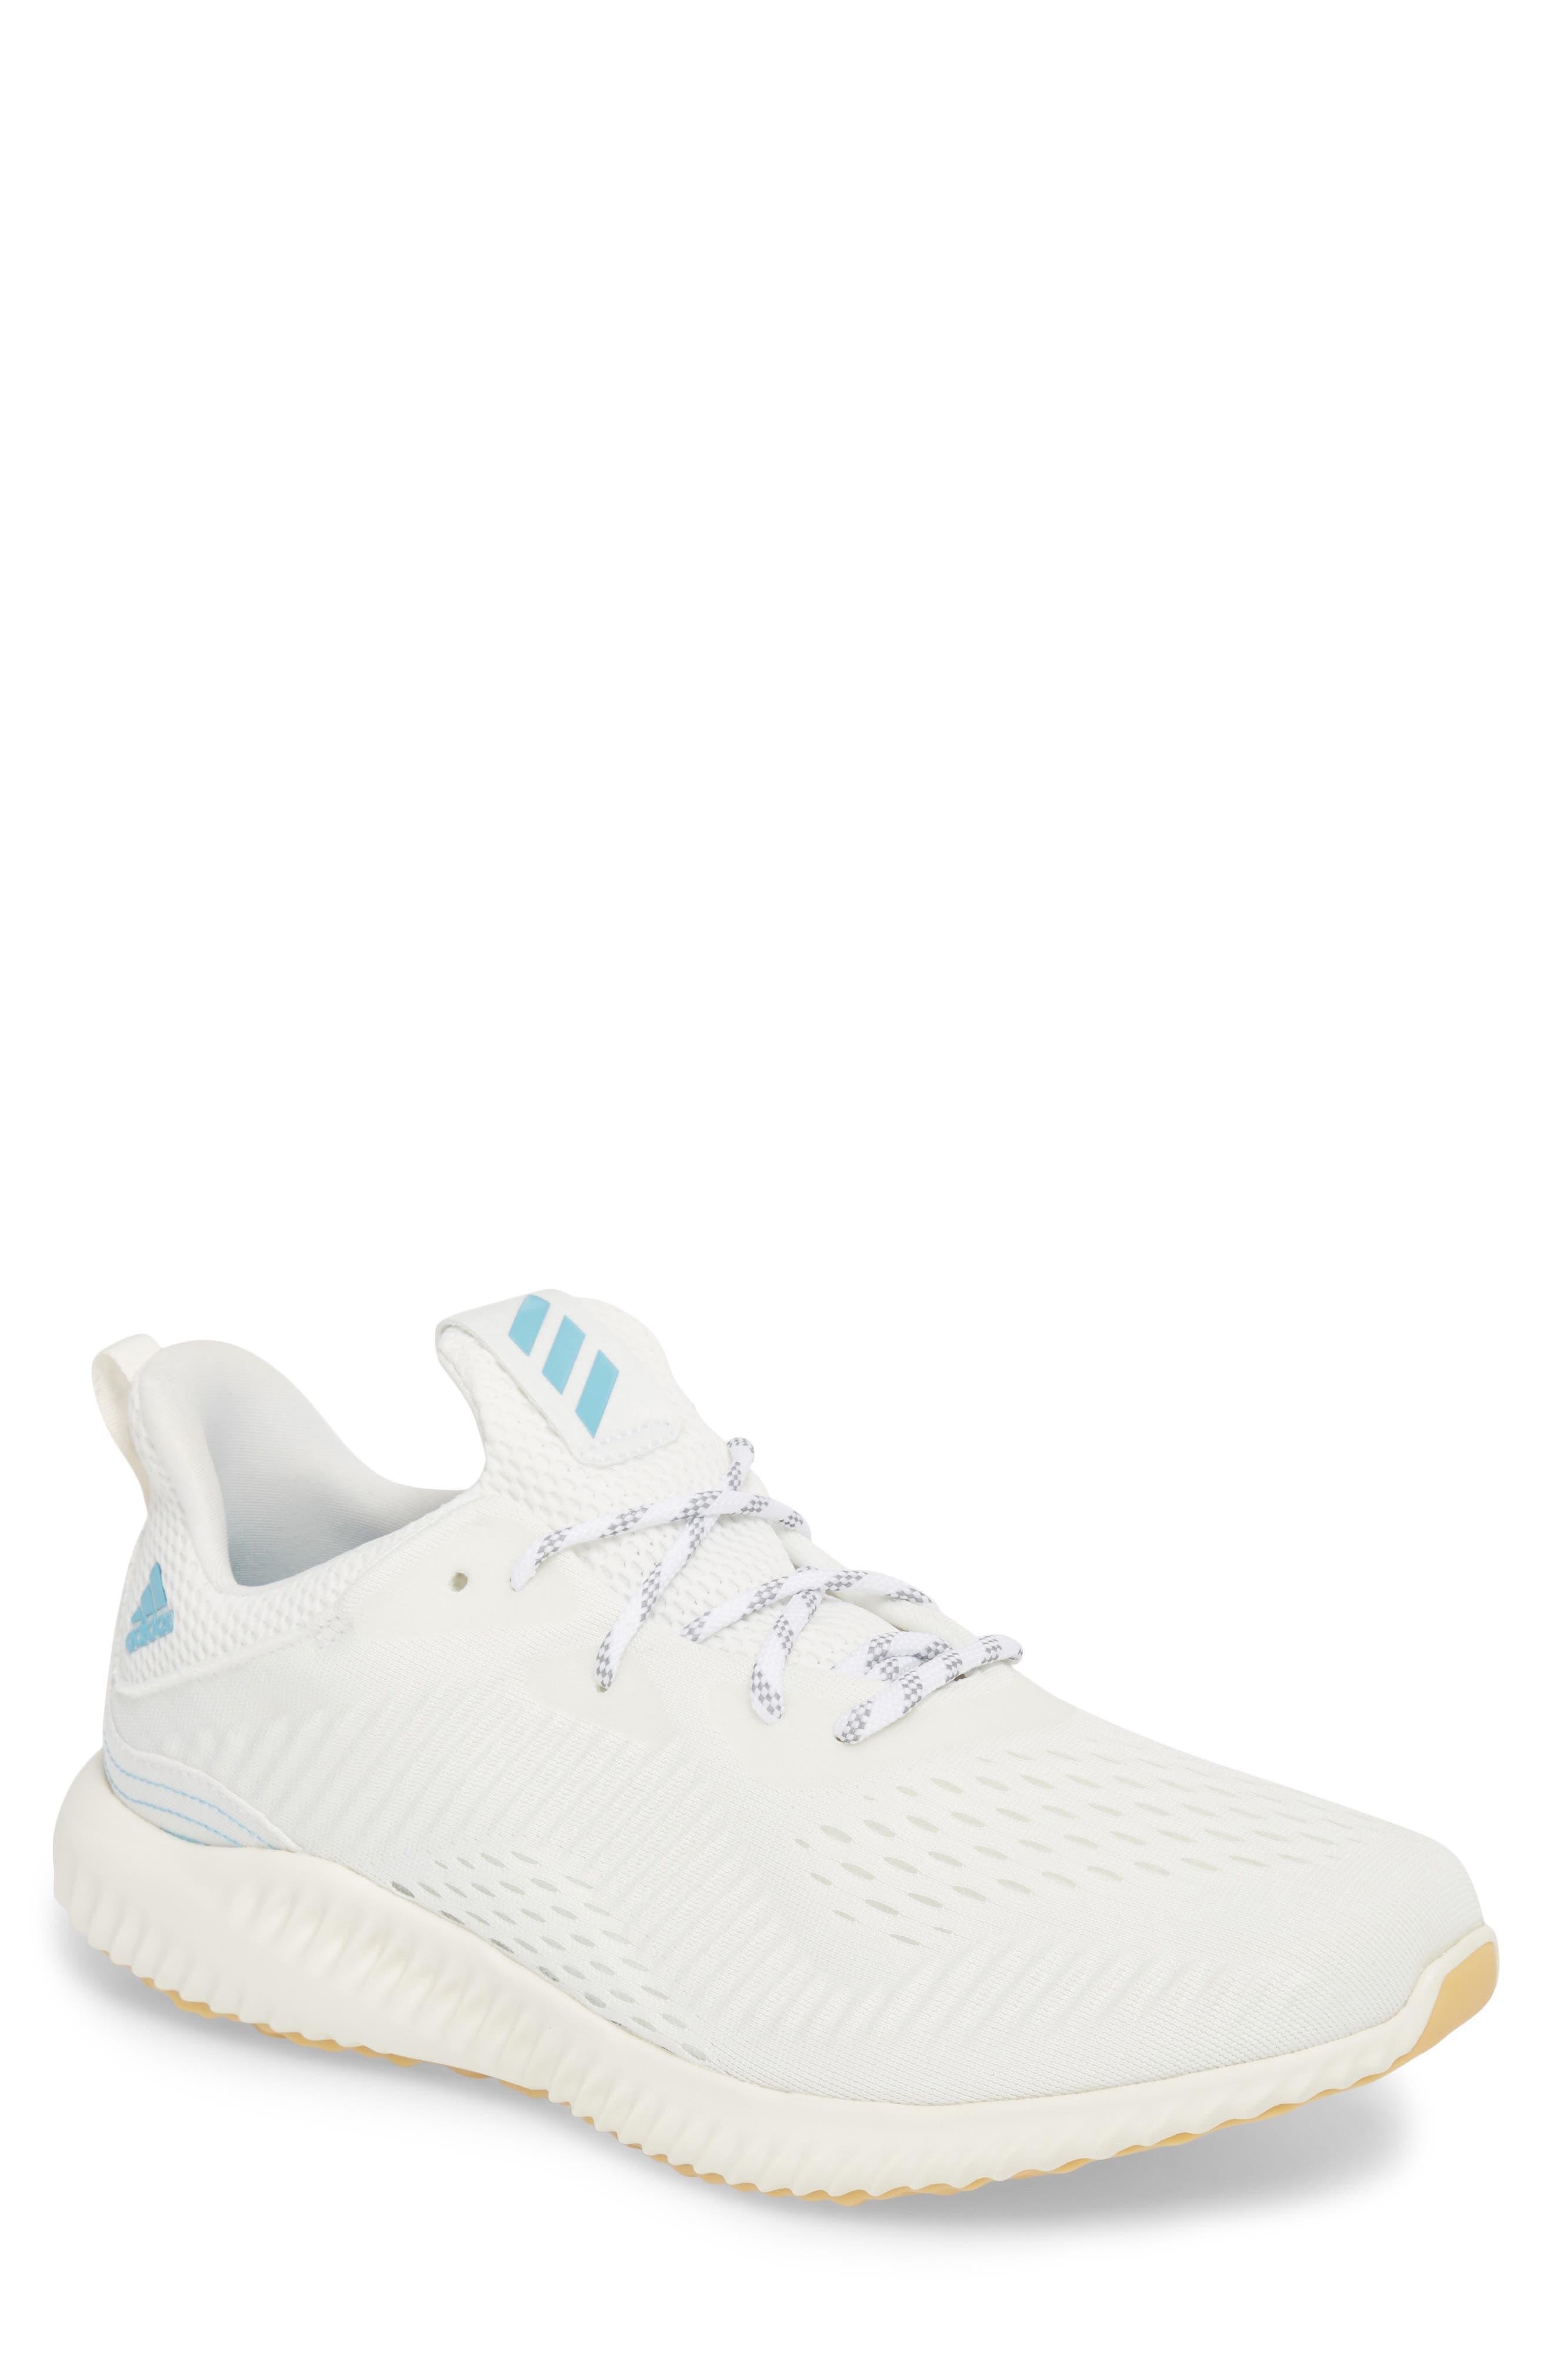 adidas AlphaBounce 1 Parley Running Shoe (Men)